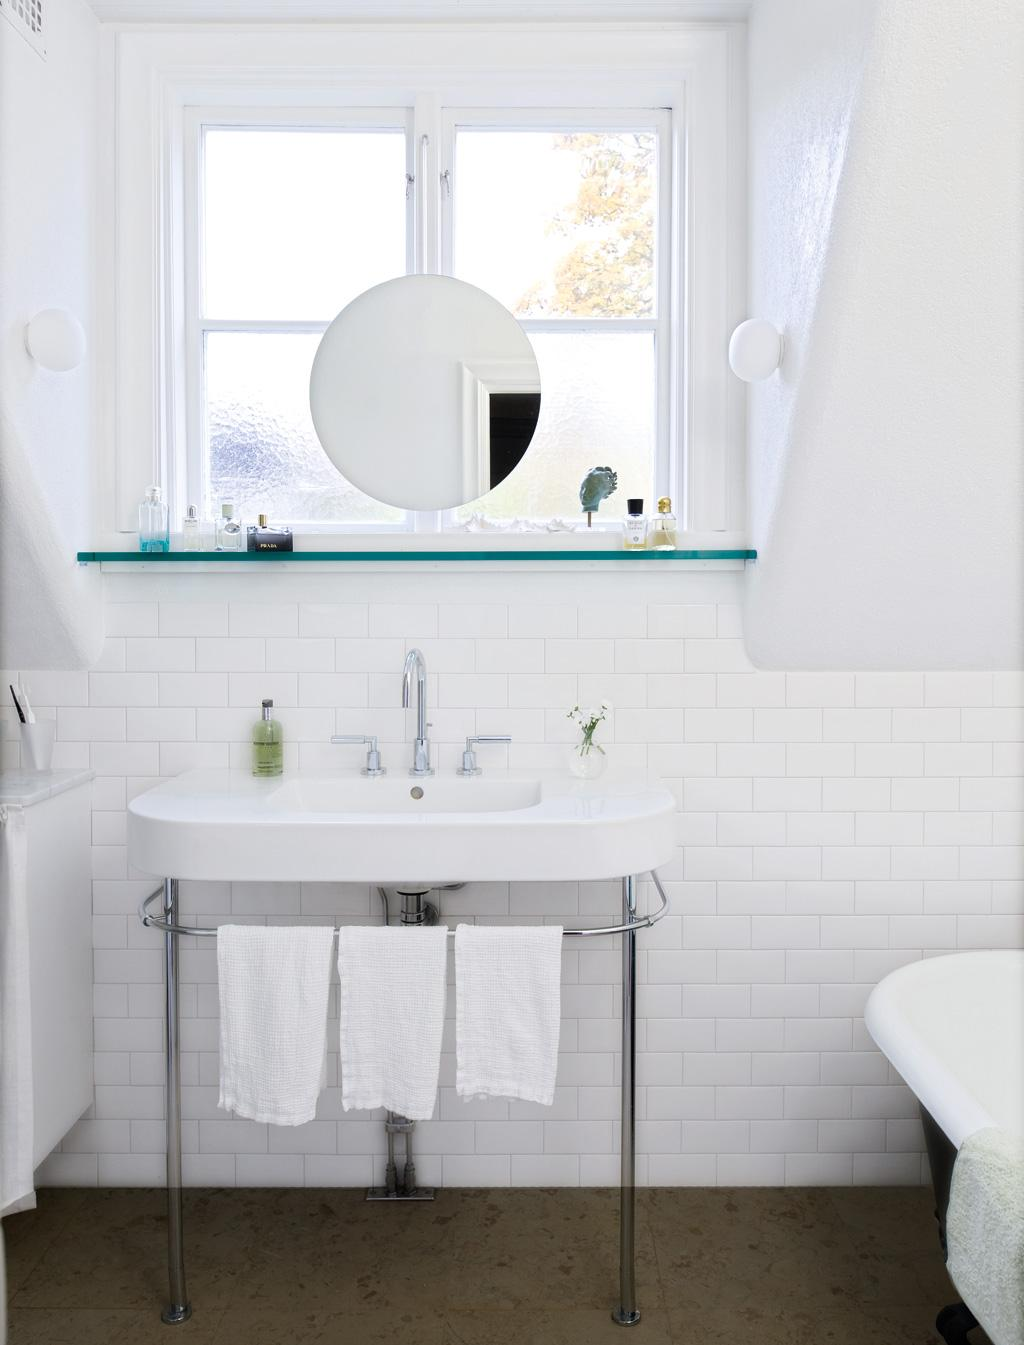 Badrum små badrum inspiration : Modernt badrum med 20-talstouch – Hus & Hem